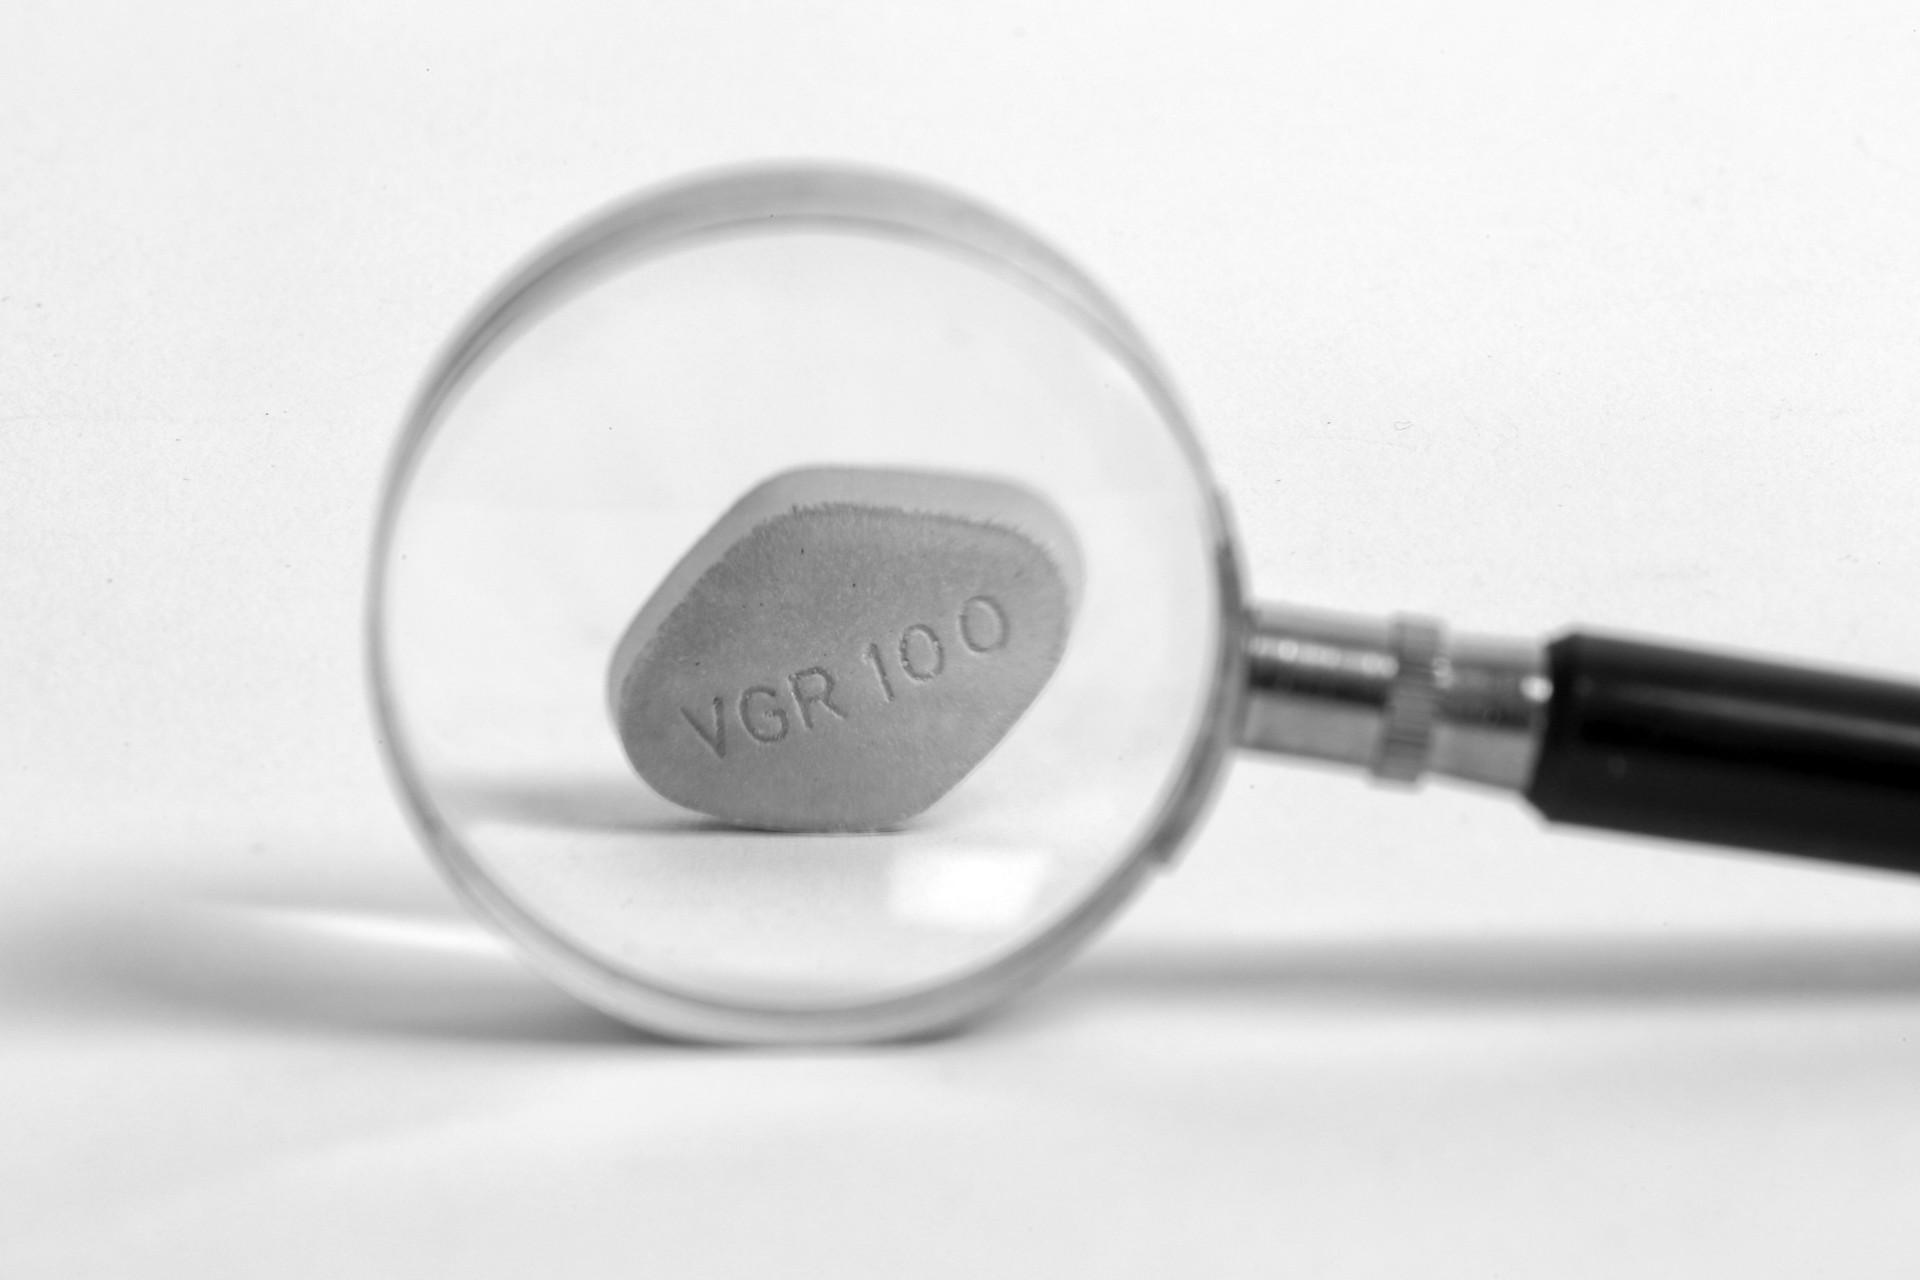 100 mg Viagra tablett – mure ja lootuse allikas. Foto: Tim Reckmann (CC BY 2.0)